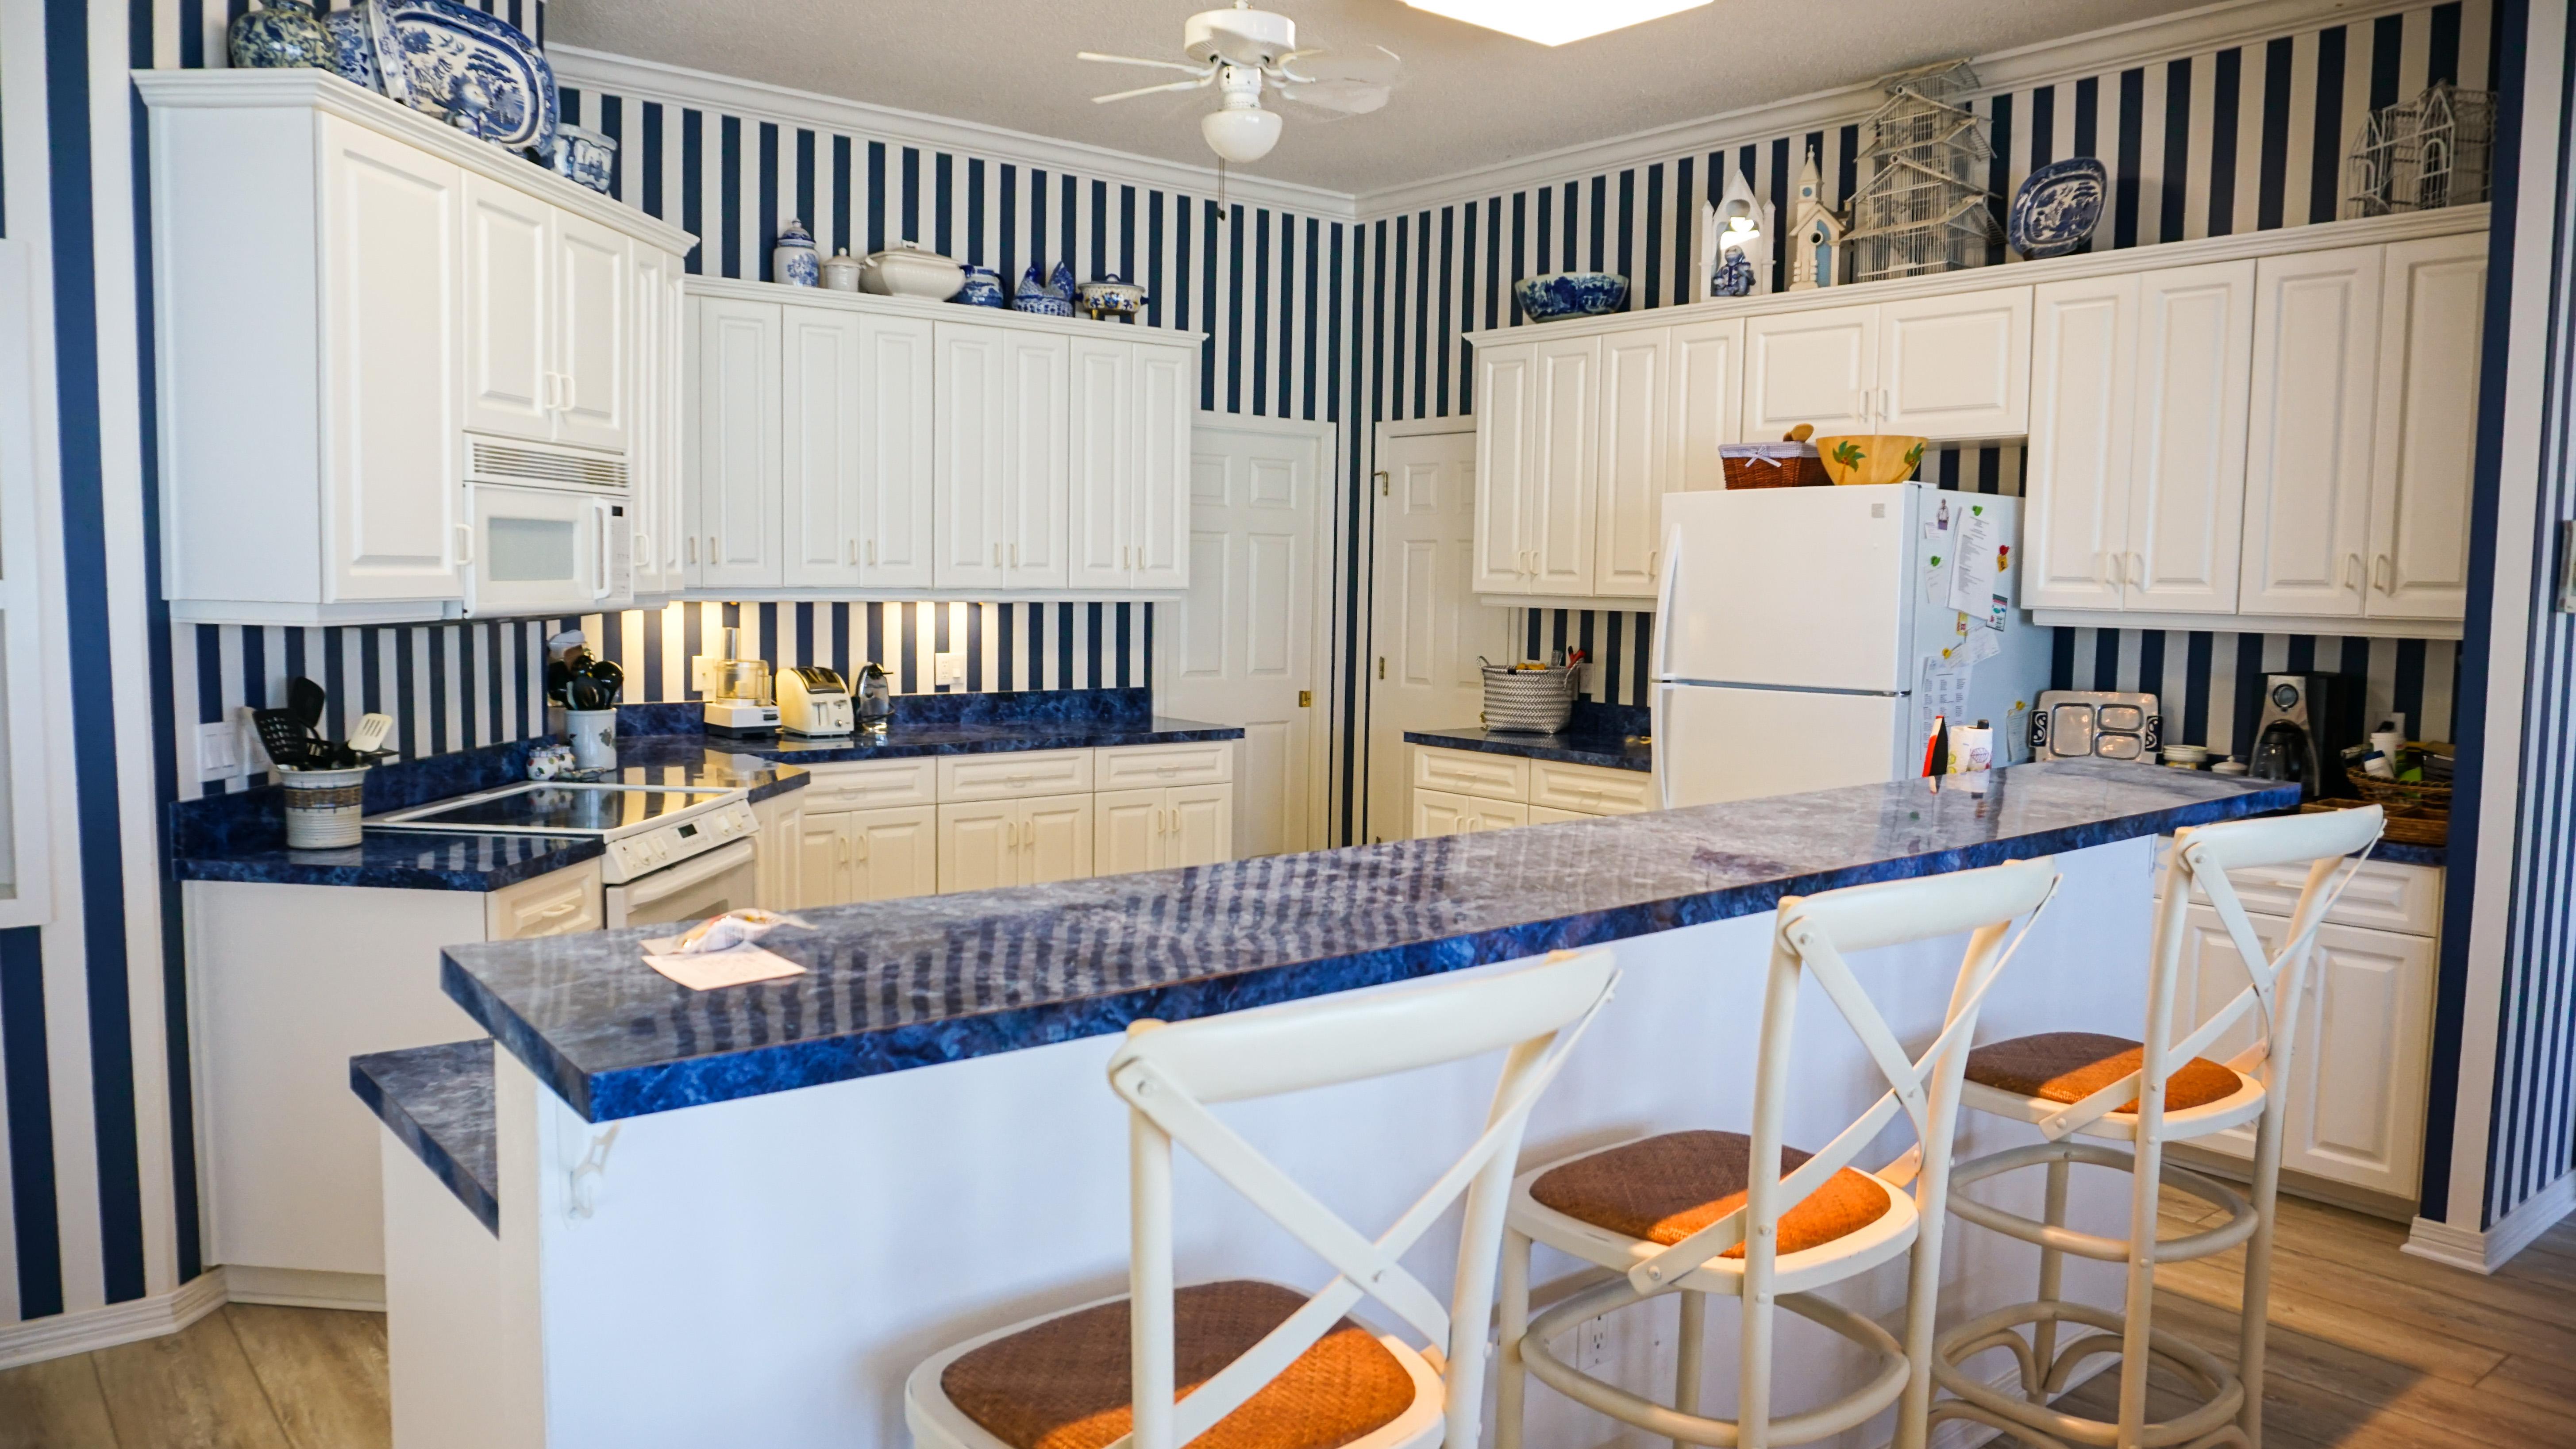 Ensenada Cinco 1730 House/Cottage rental in Pensacola Beach House Rentals in Pensacola Beach Florida - #6